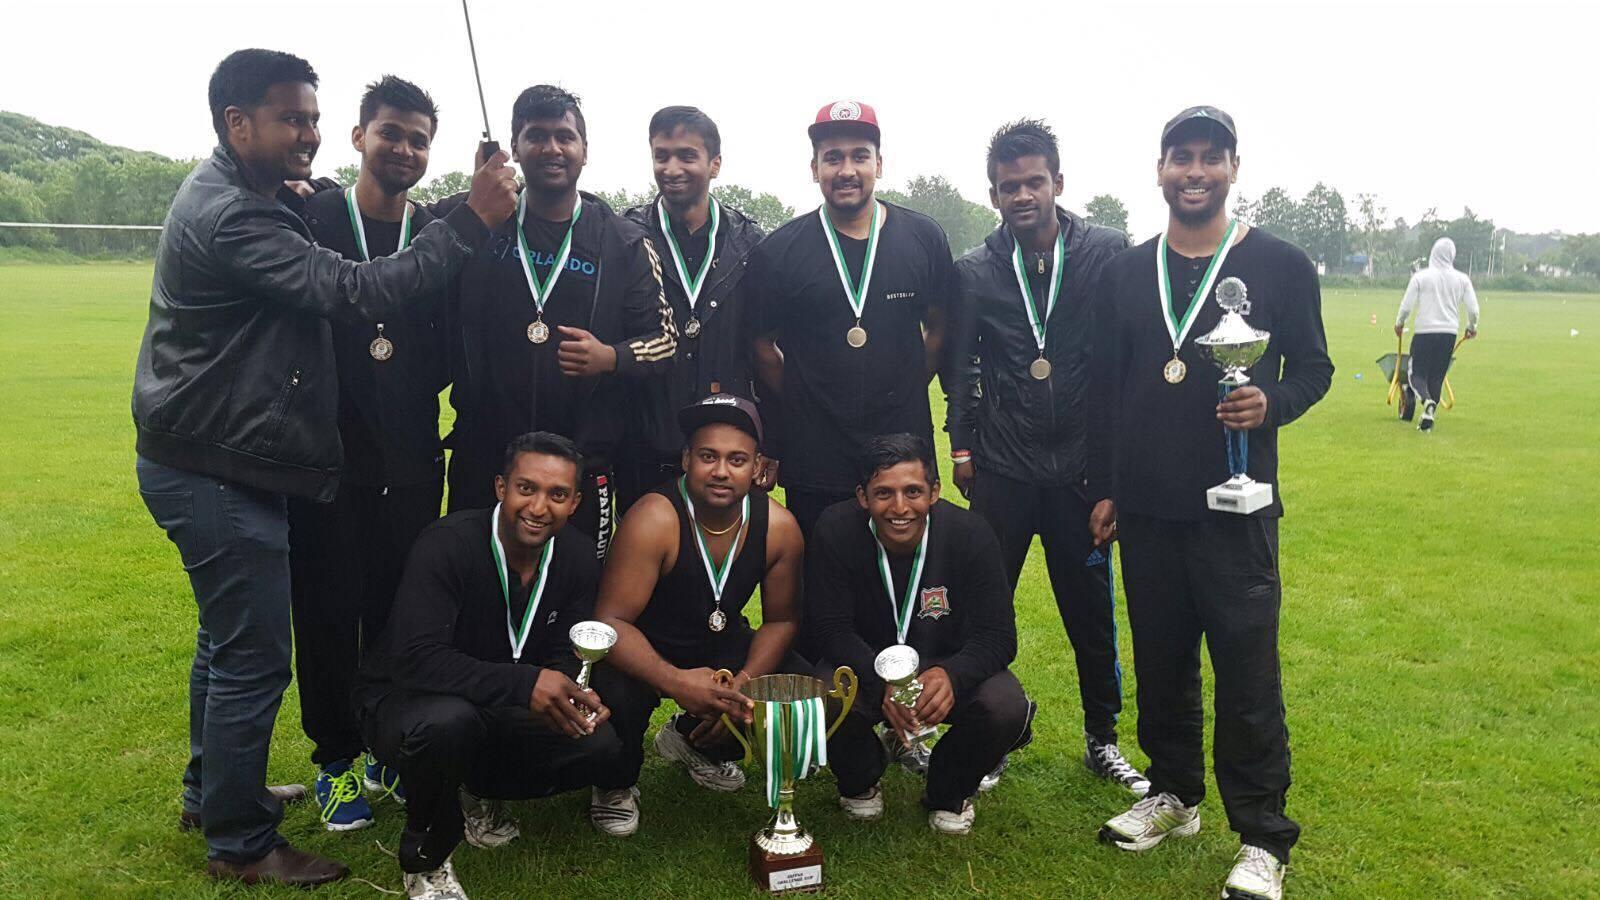 Dantam - Jaffna cup Champions 2016